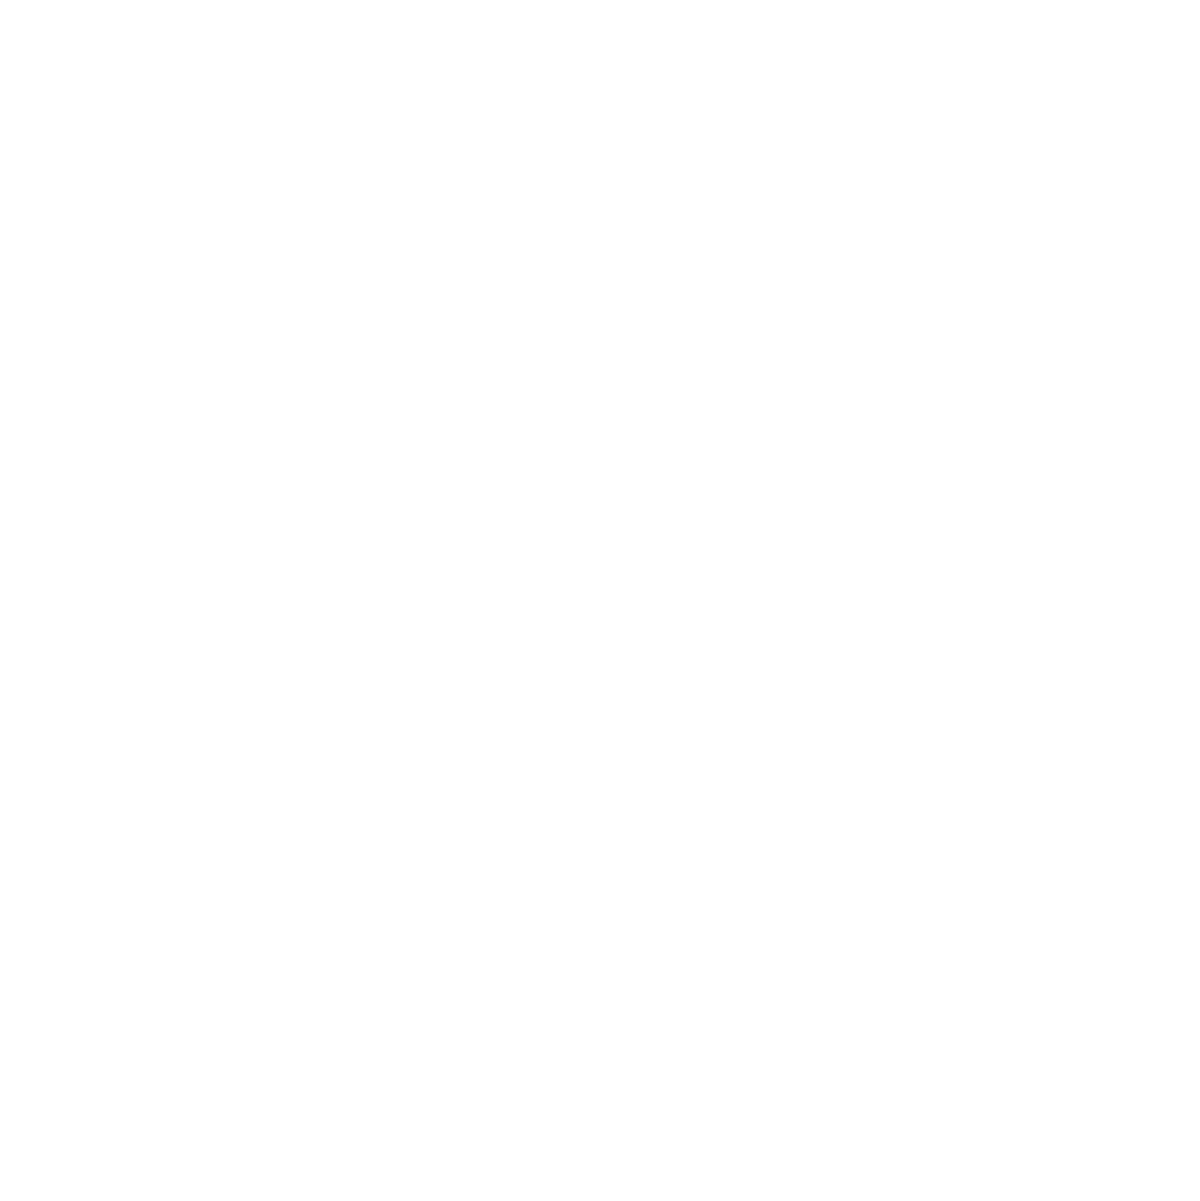 state of alaska senior and disabiltiy services